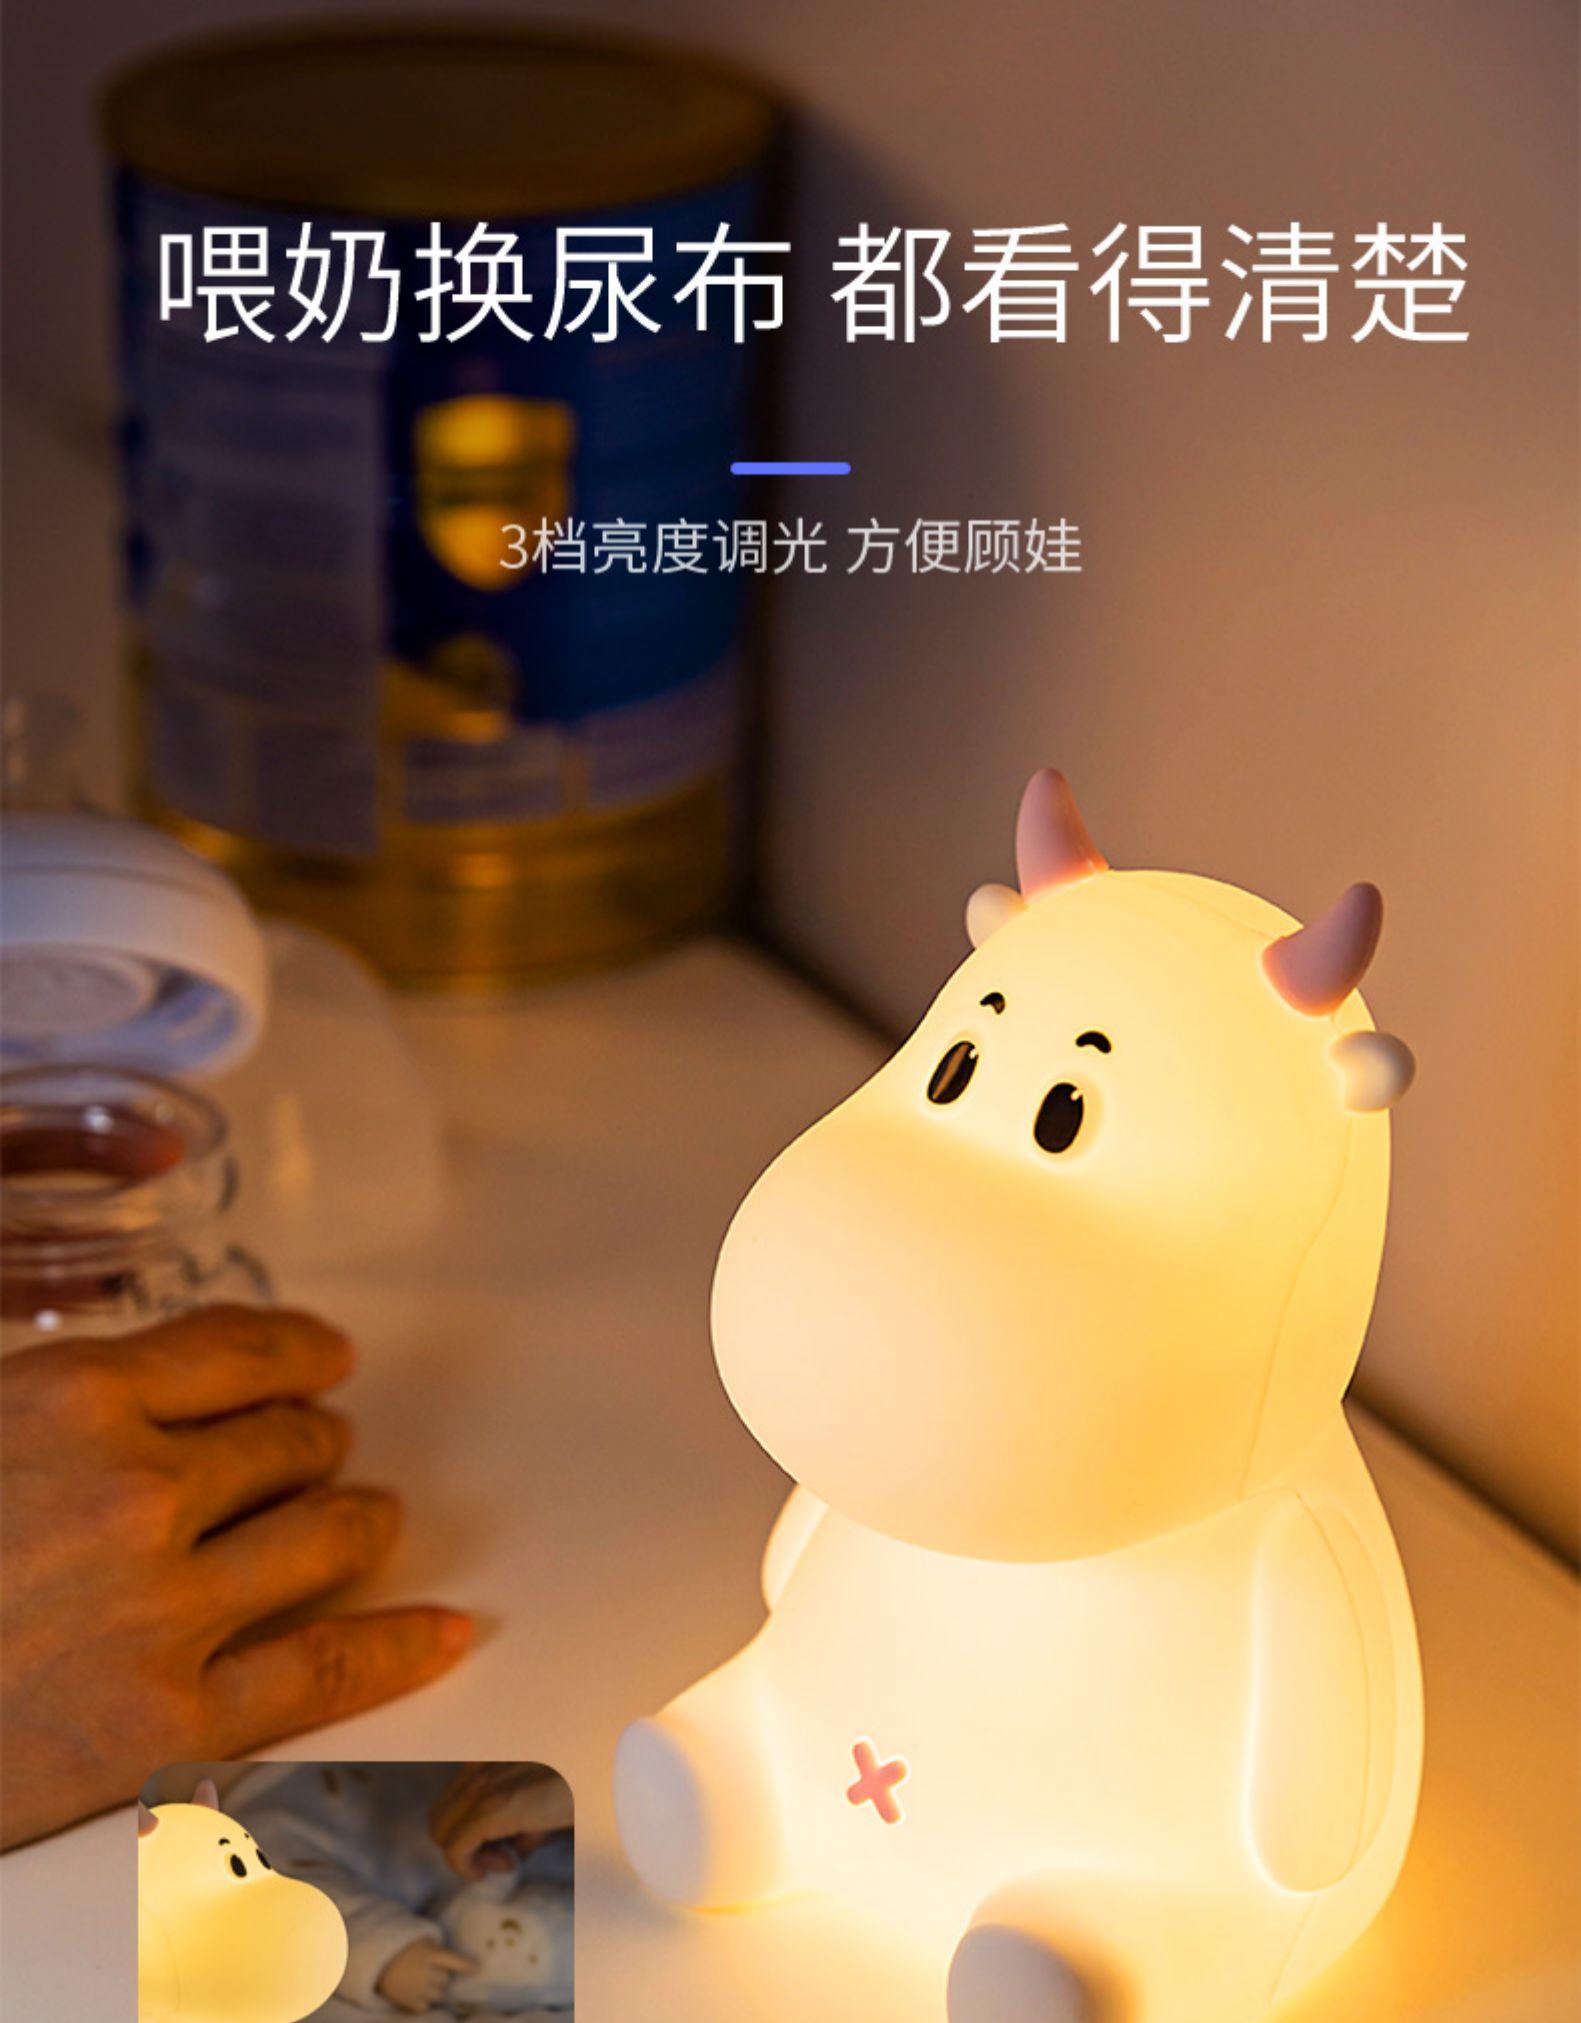 LED Night Light Baby Soft Cute Sensor Chargeable Night Lights Kids Bedroom Kawaii Atmosphere Mushroom Lamp Night Lights BG50NL enlarge